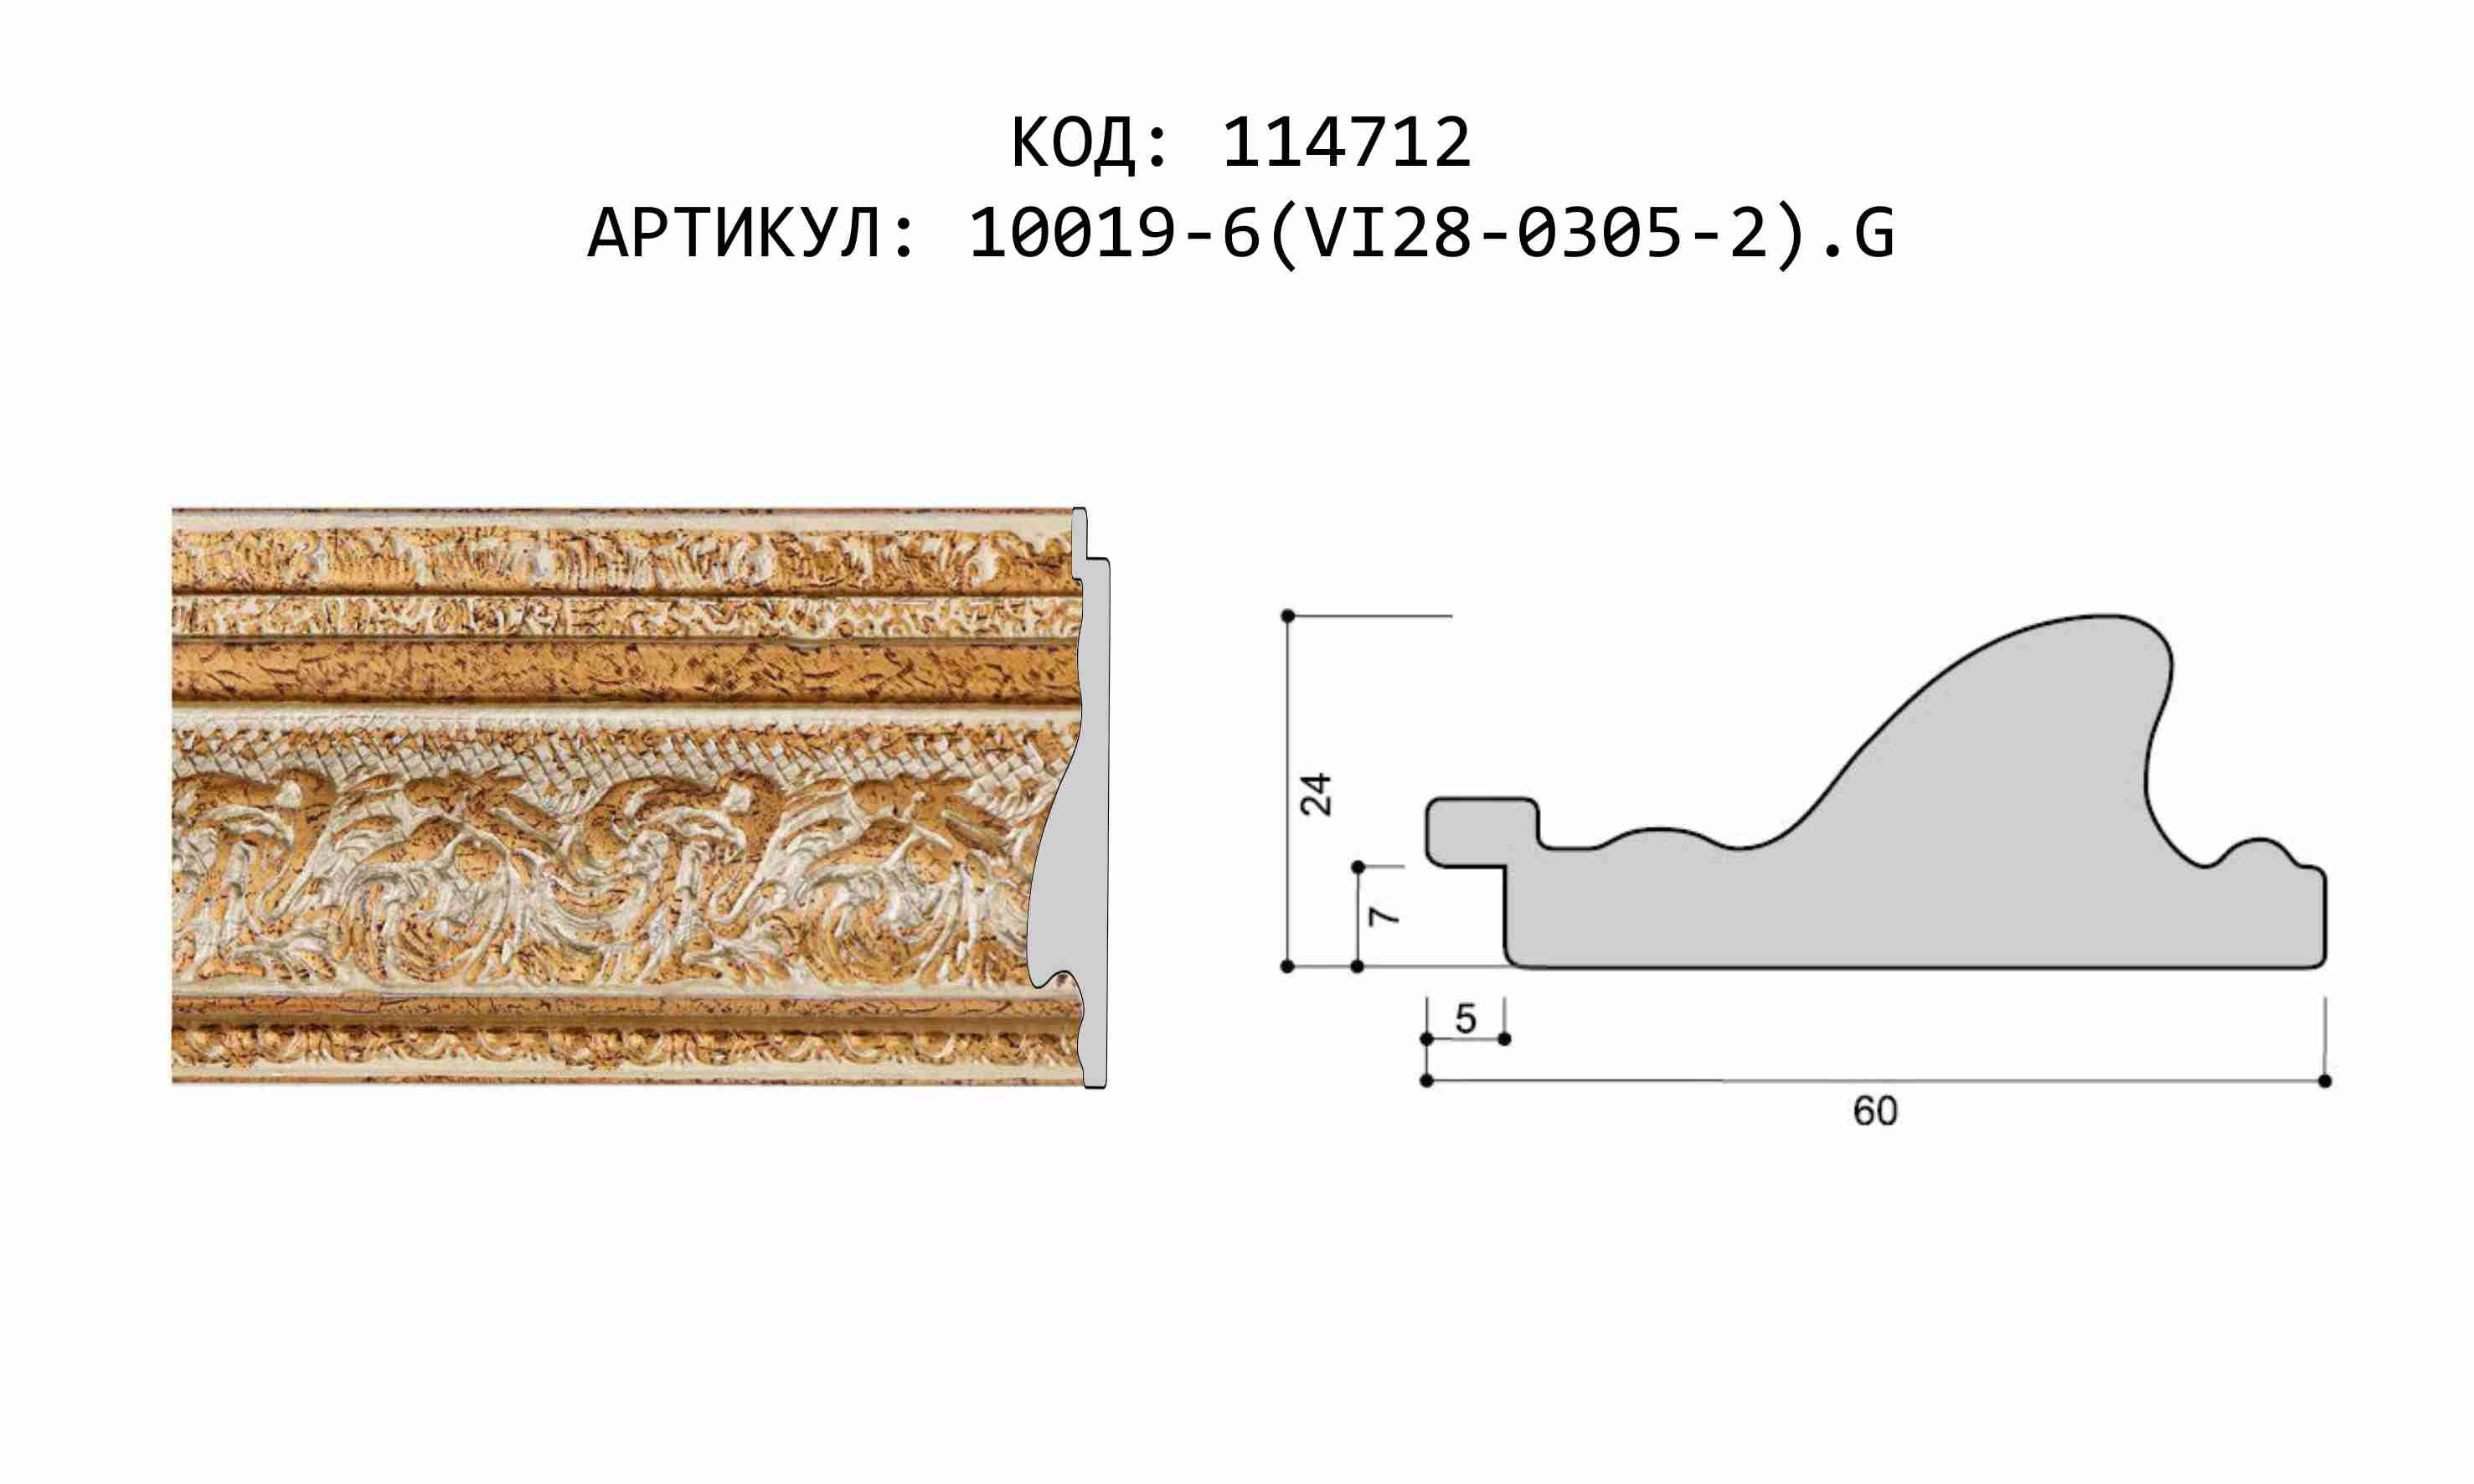 Артикул: 10019-6(VI28-0305-2).G